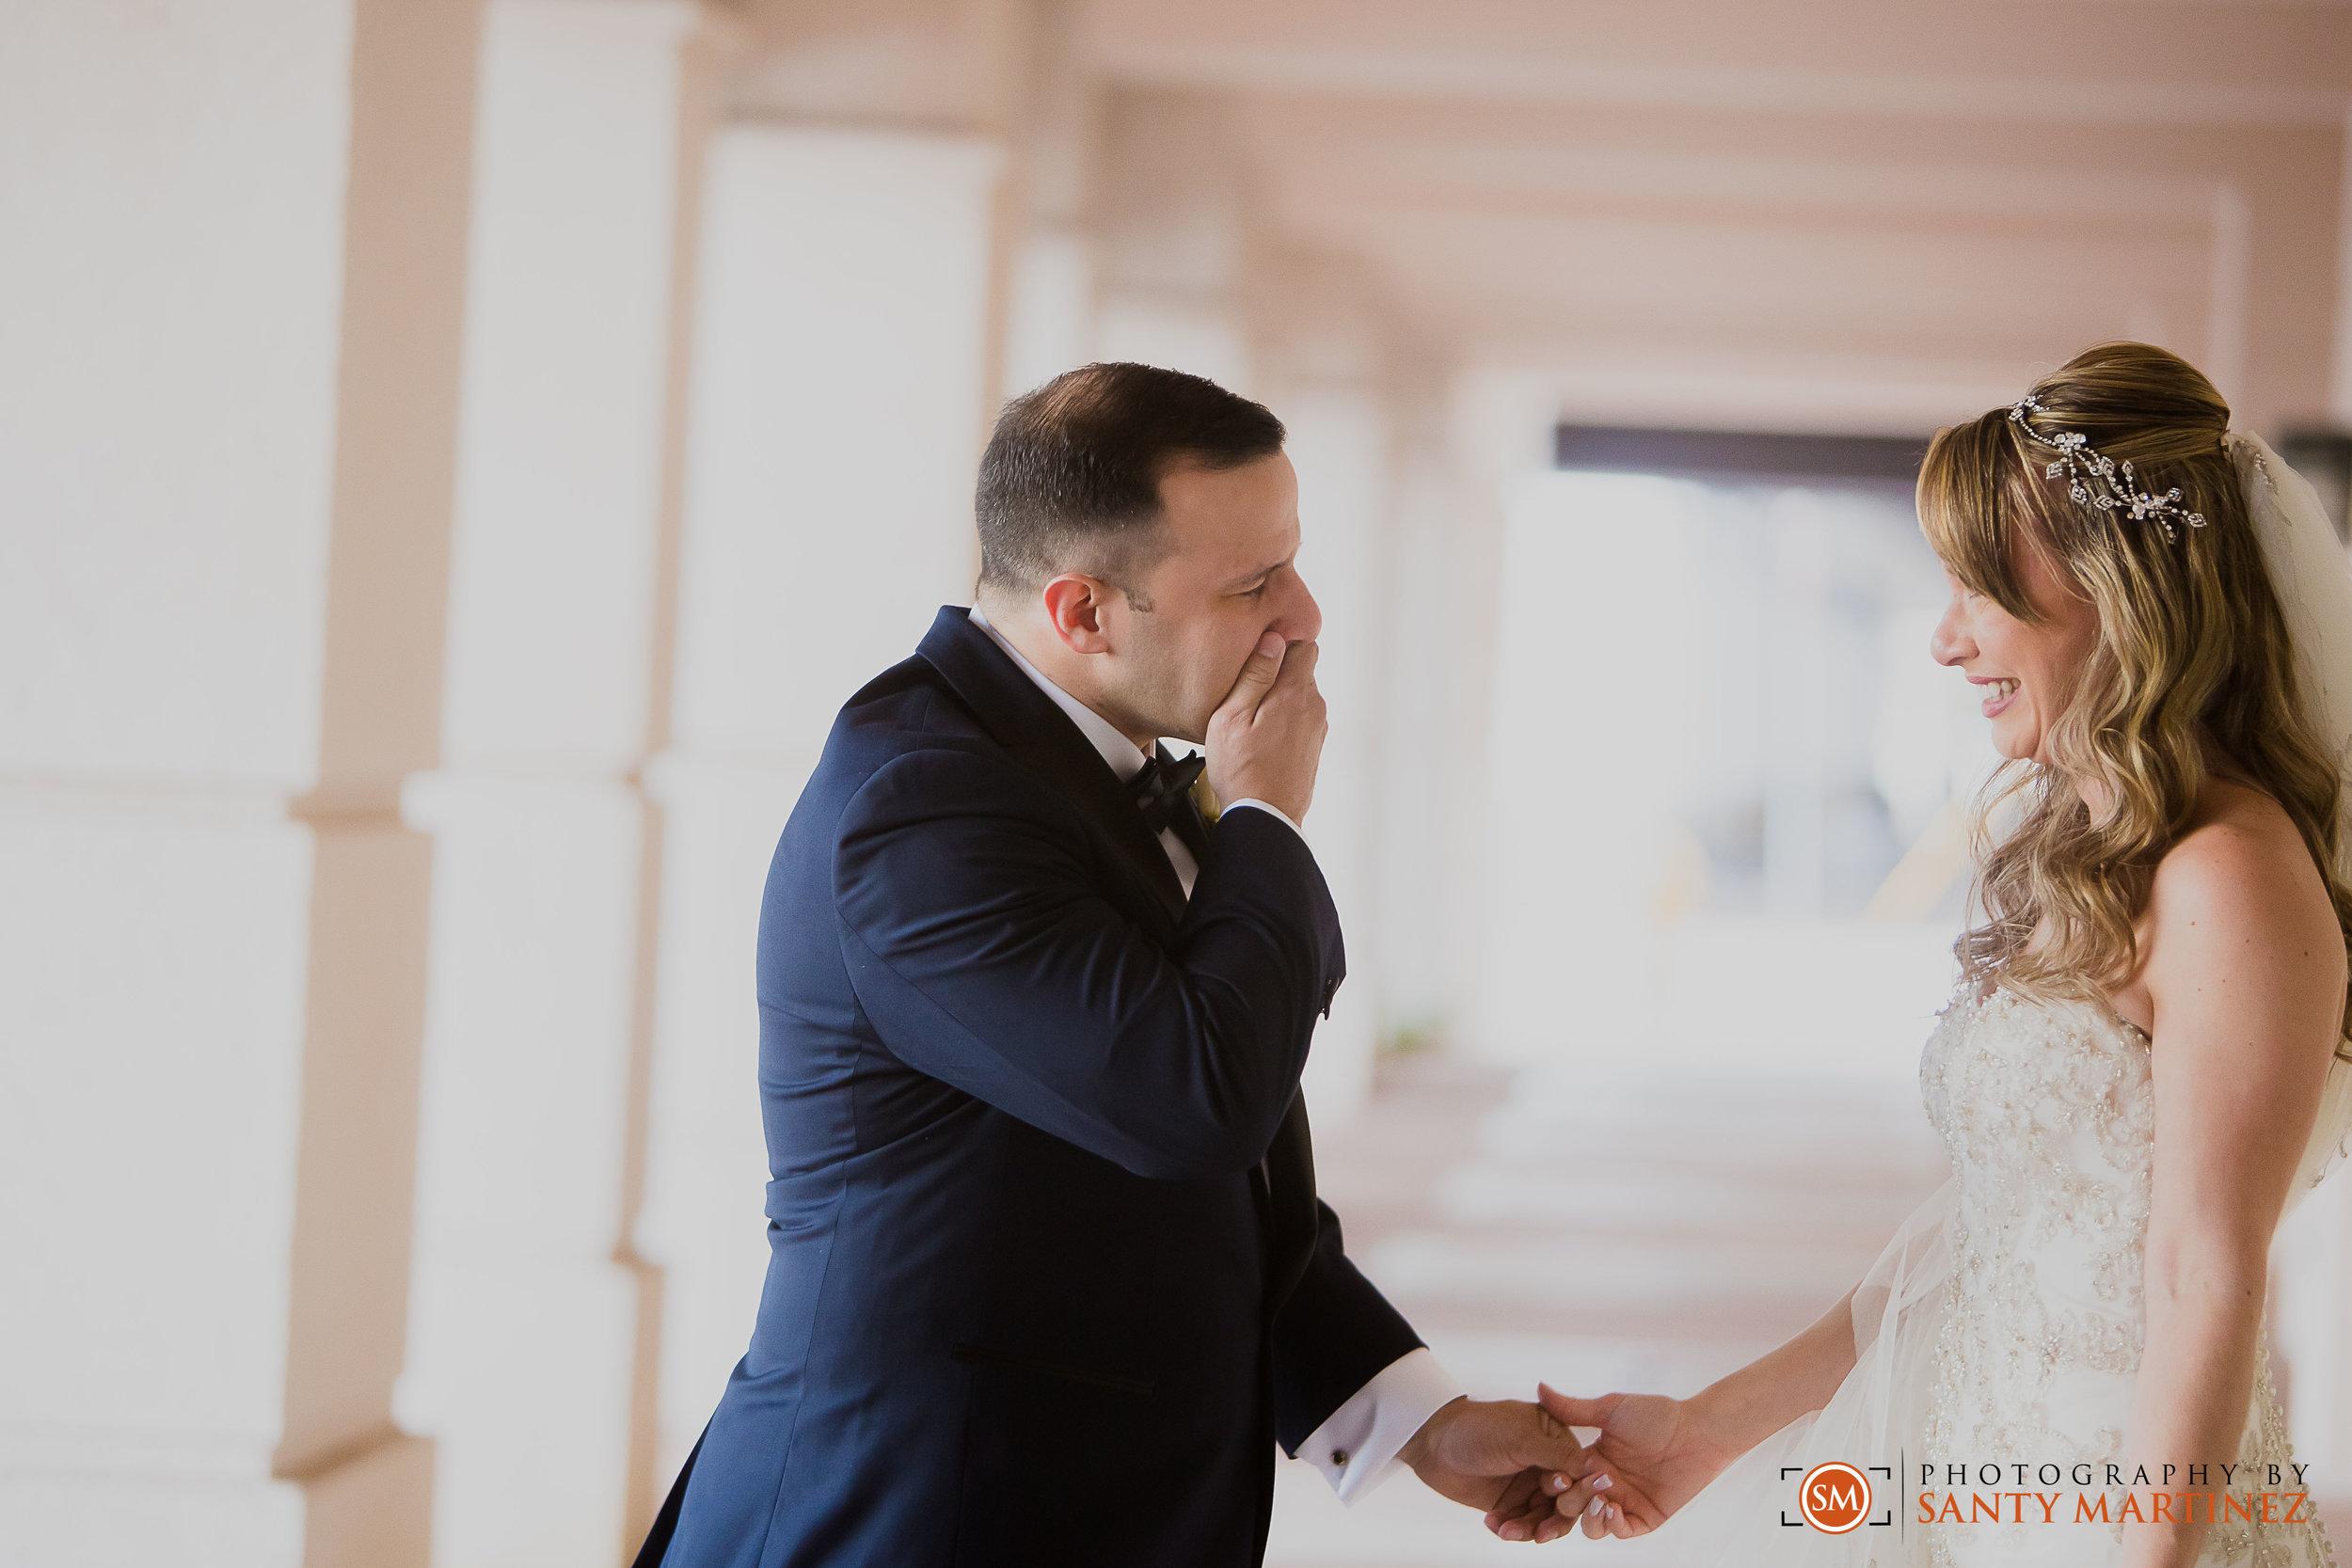 Wedding La Jolla Ballroom - Photography by Santy Martinez-17.jpg